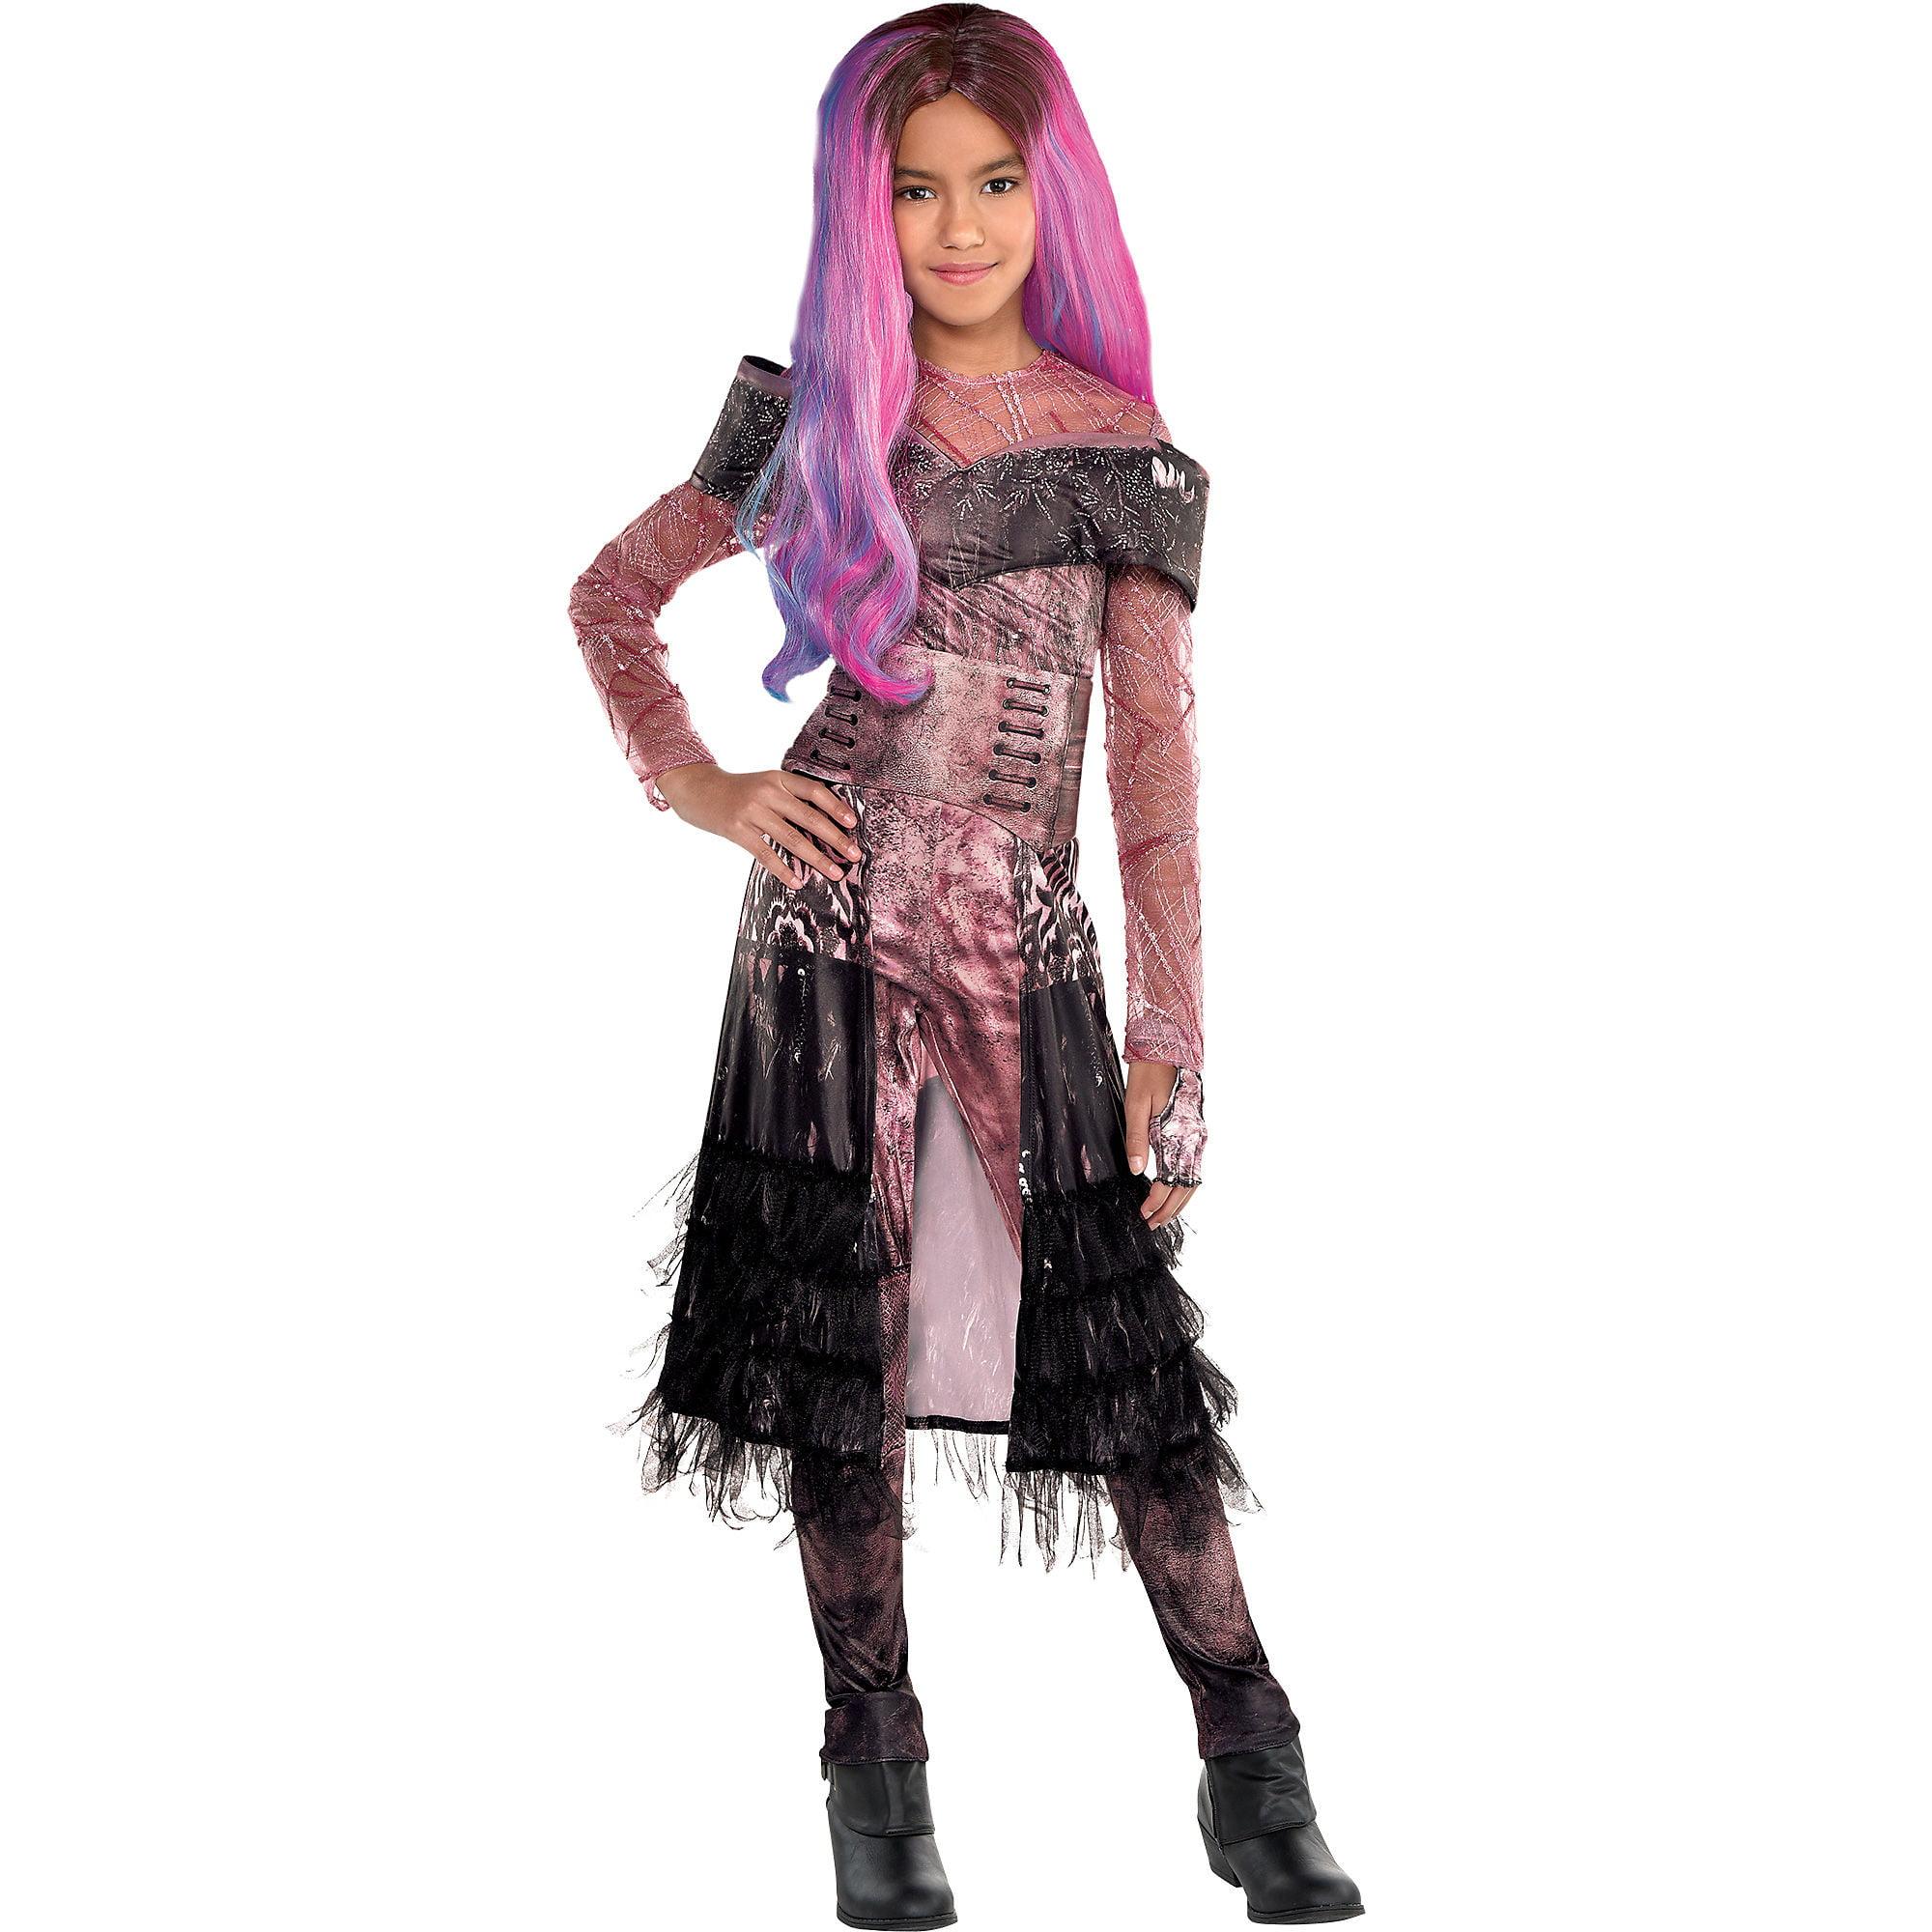 Party City Audrey Halloween Costume For Girls Descendants 3 Includes Accessories Walmart Com